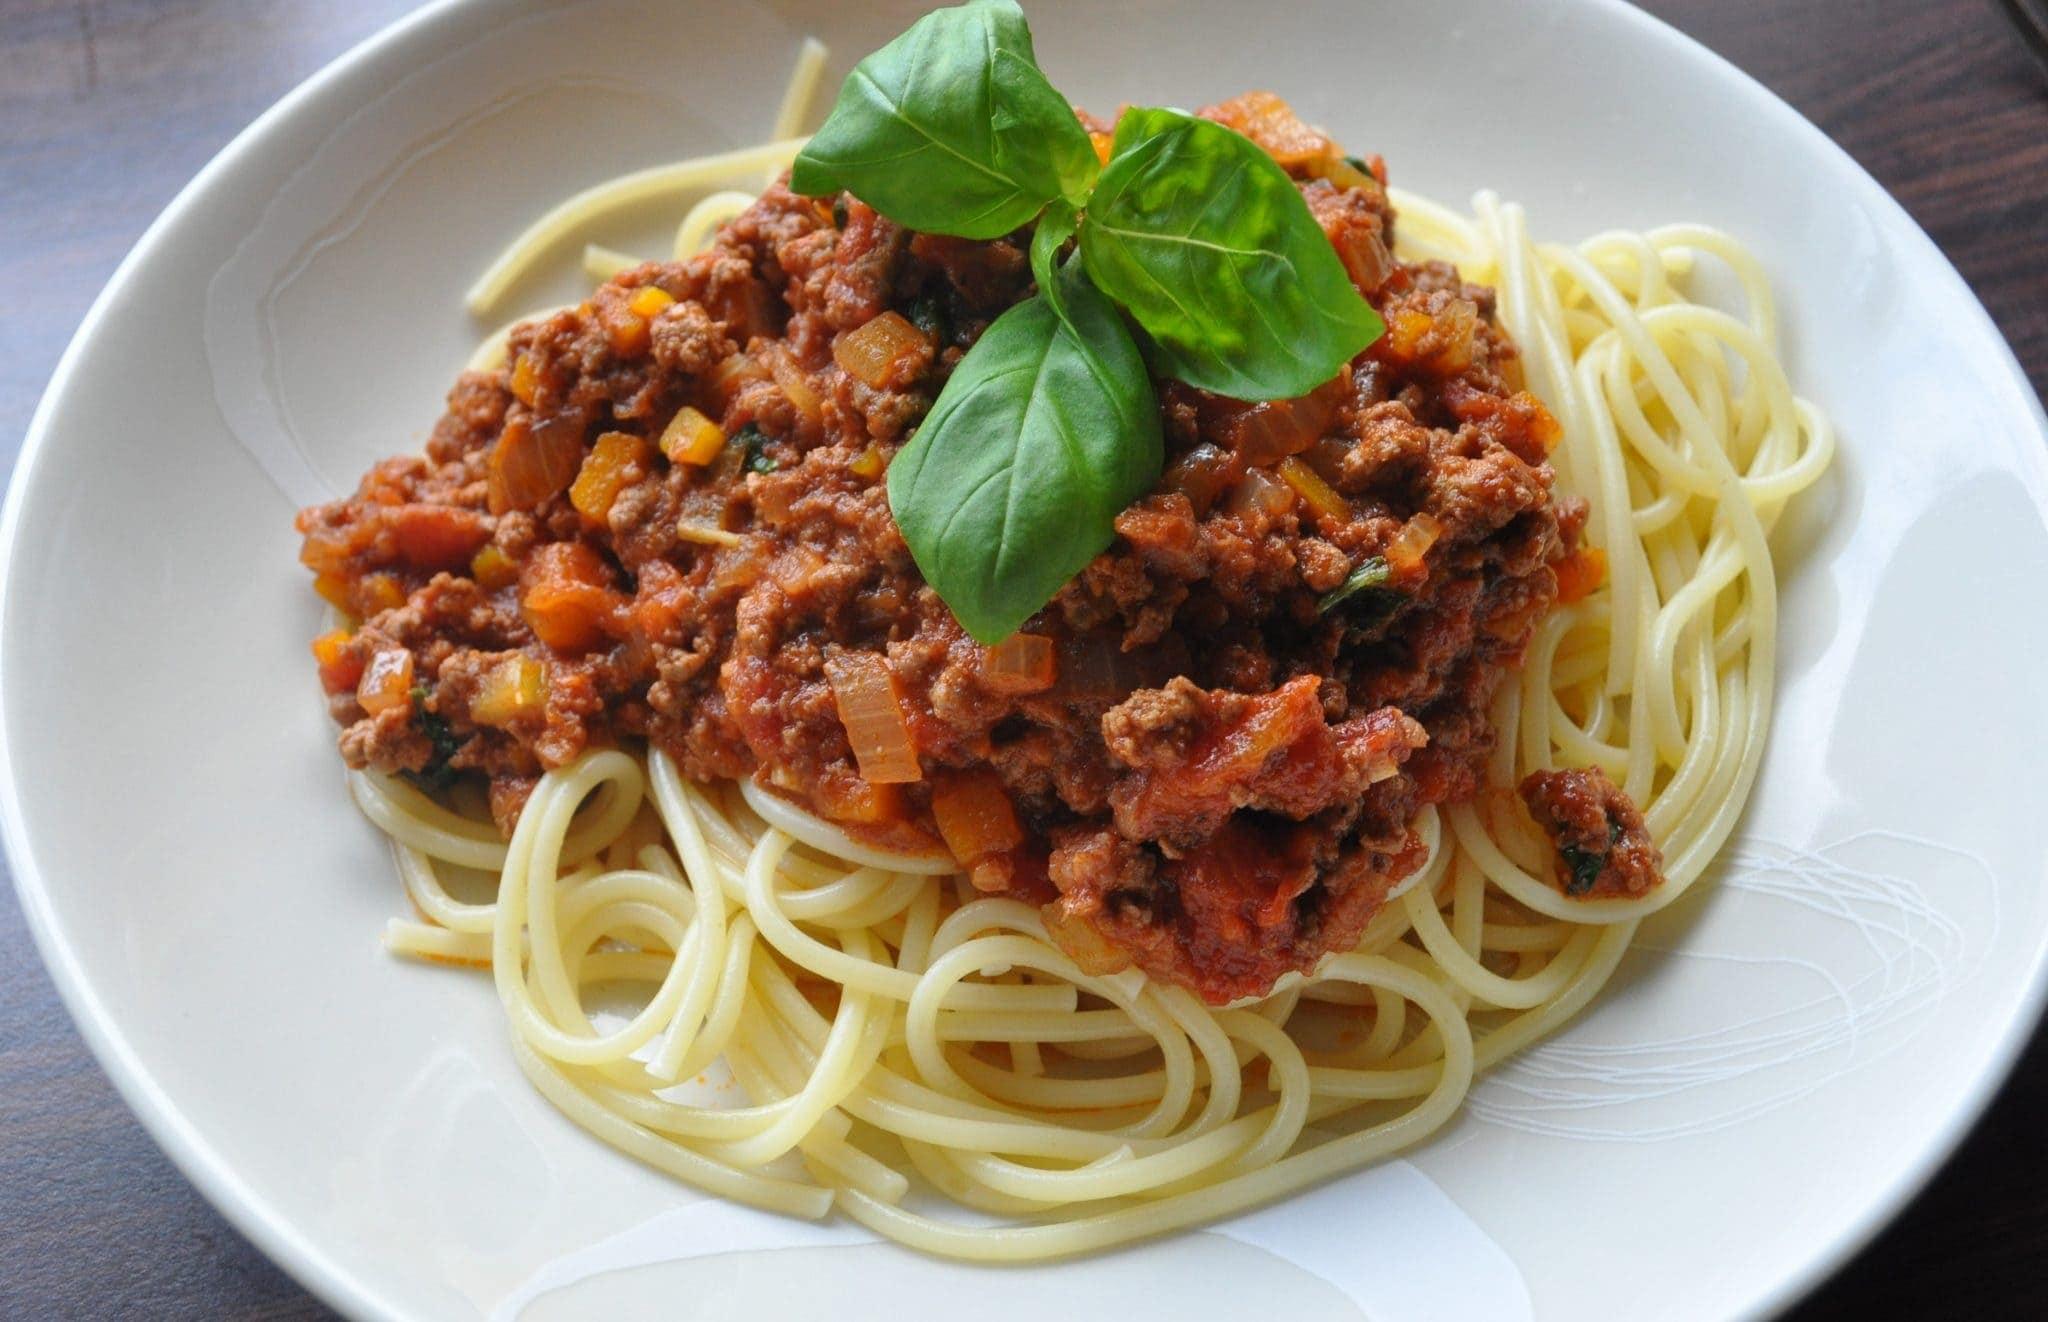 Homemade Italian spaghetti sauce is for the whole family.